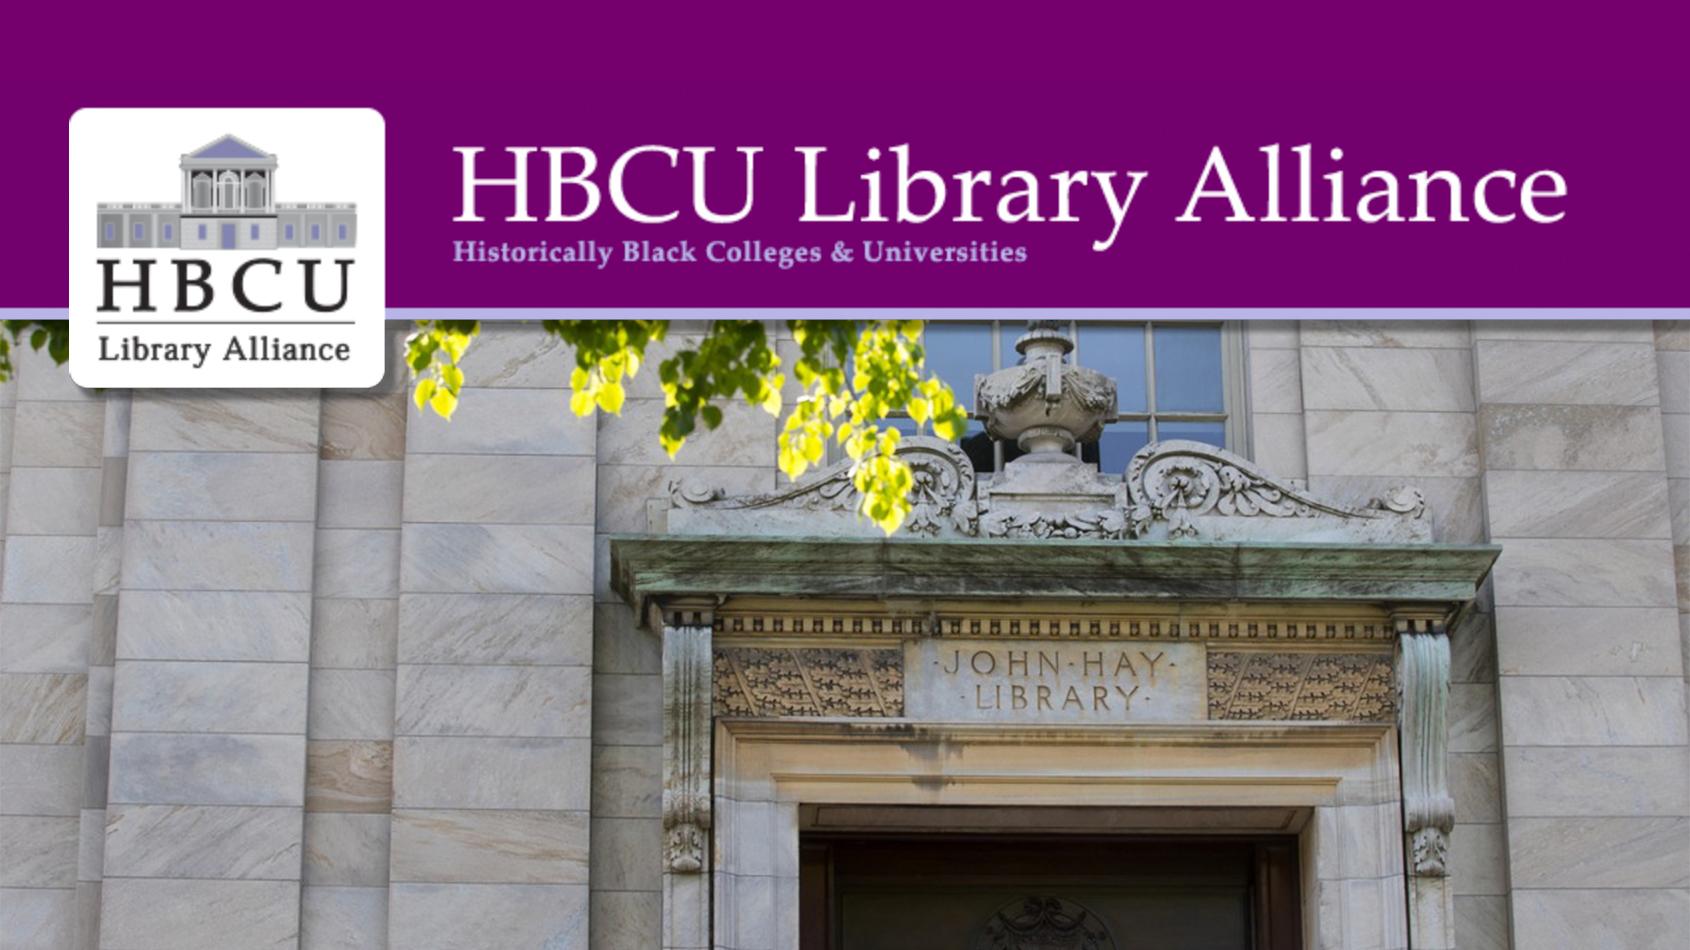 HBCU Library Alliance